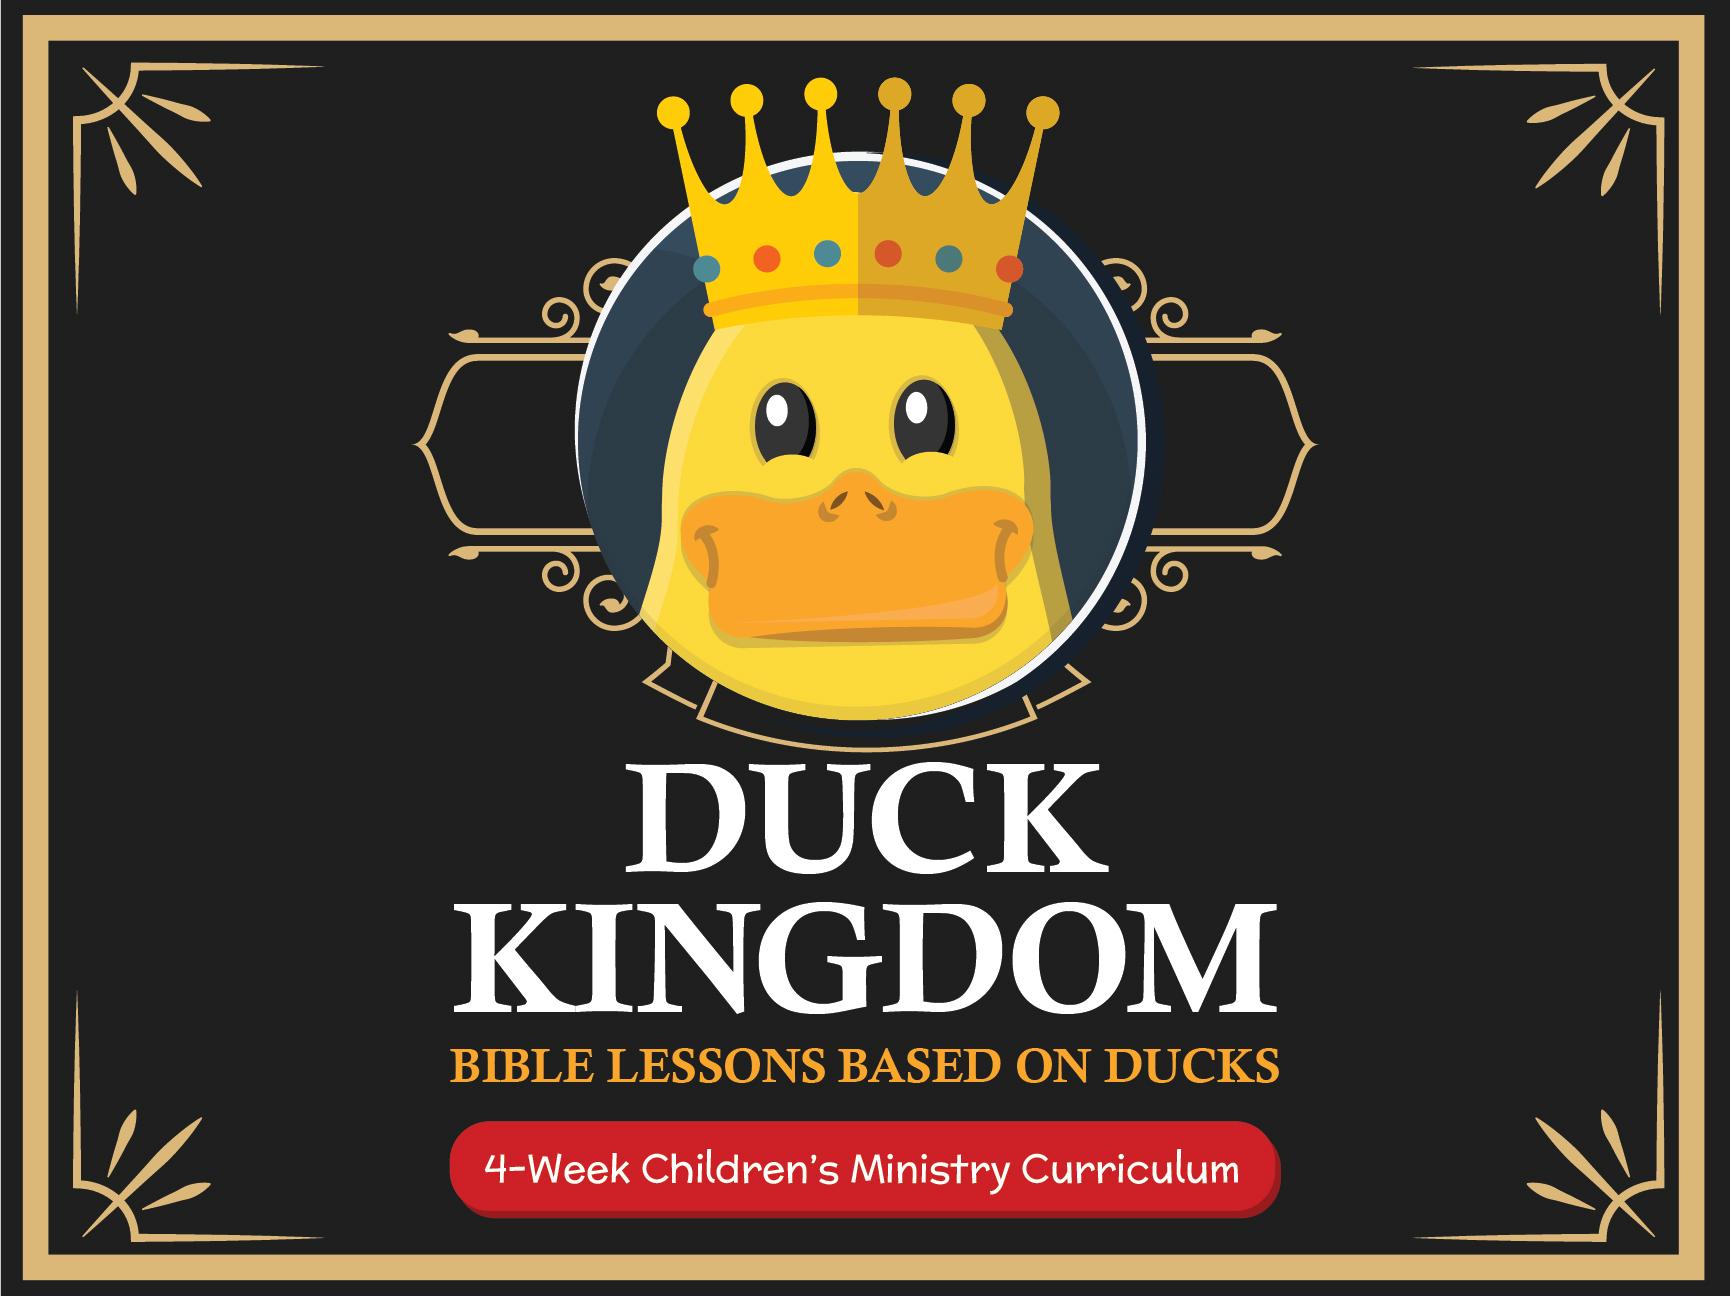 DUCK KINGDOM 4-WEEK CURRICULUM